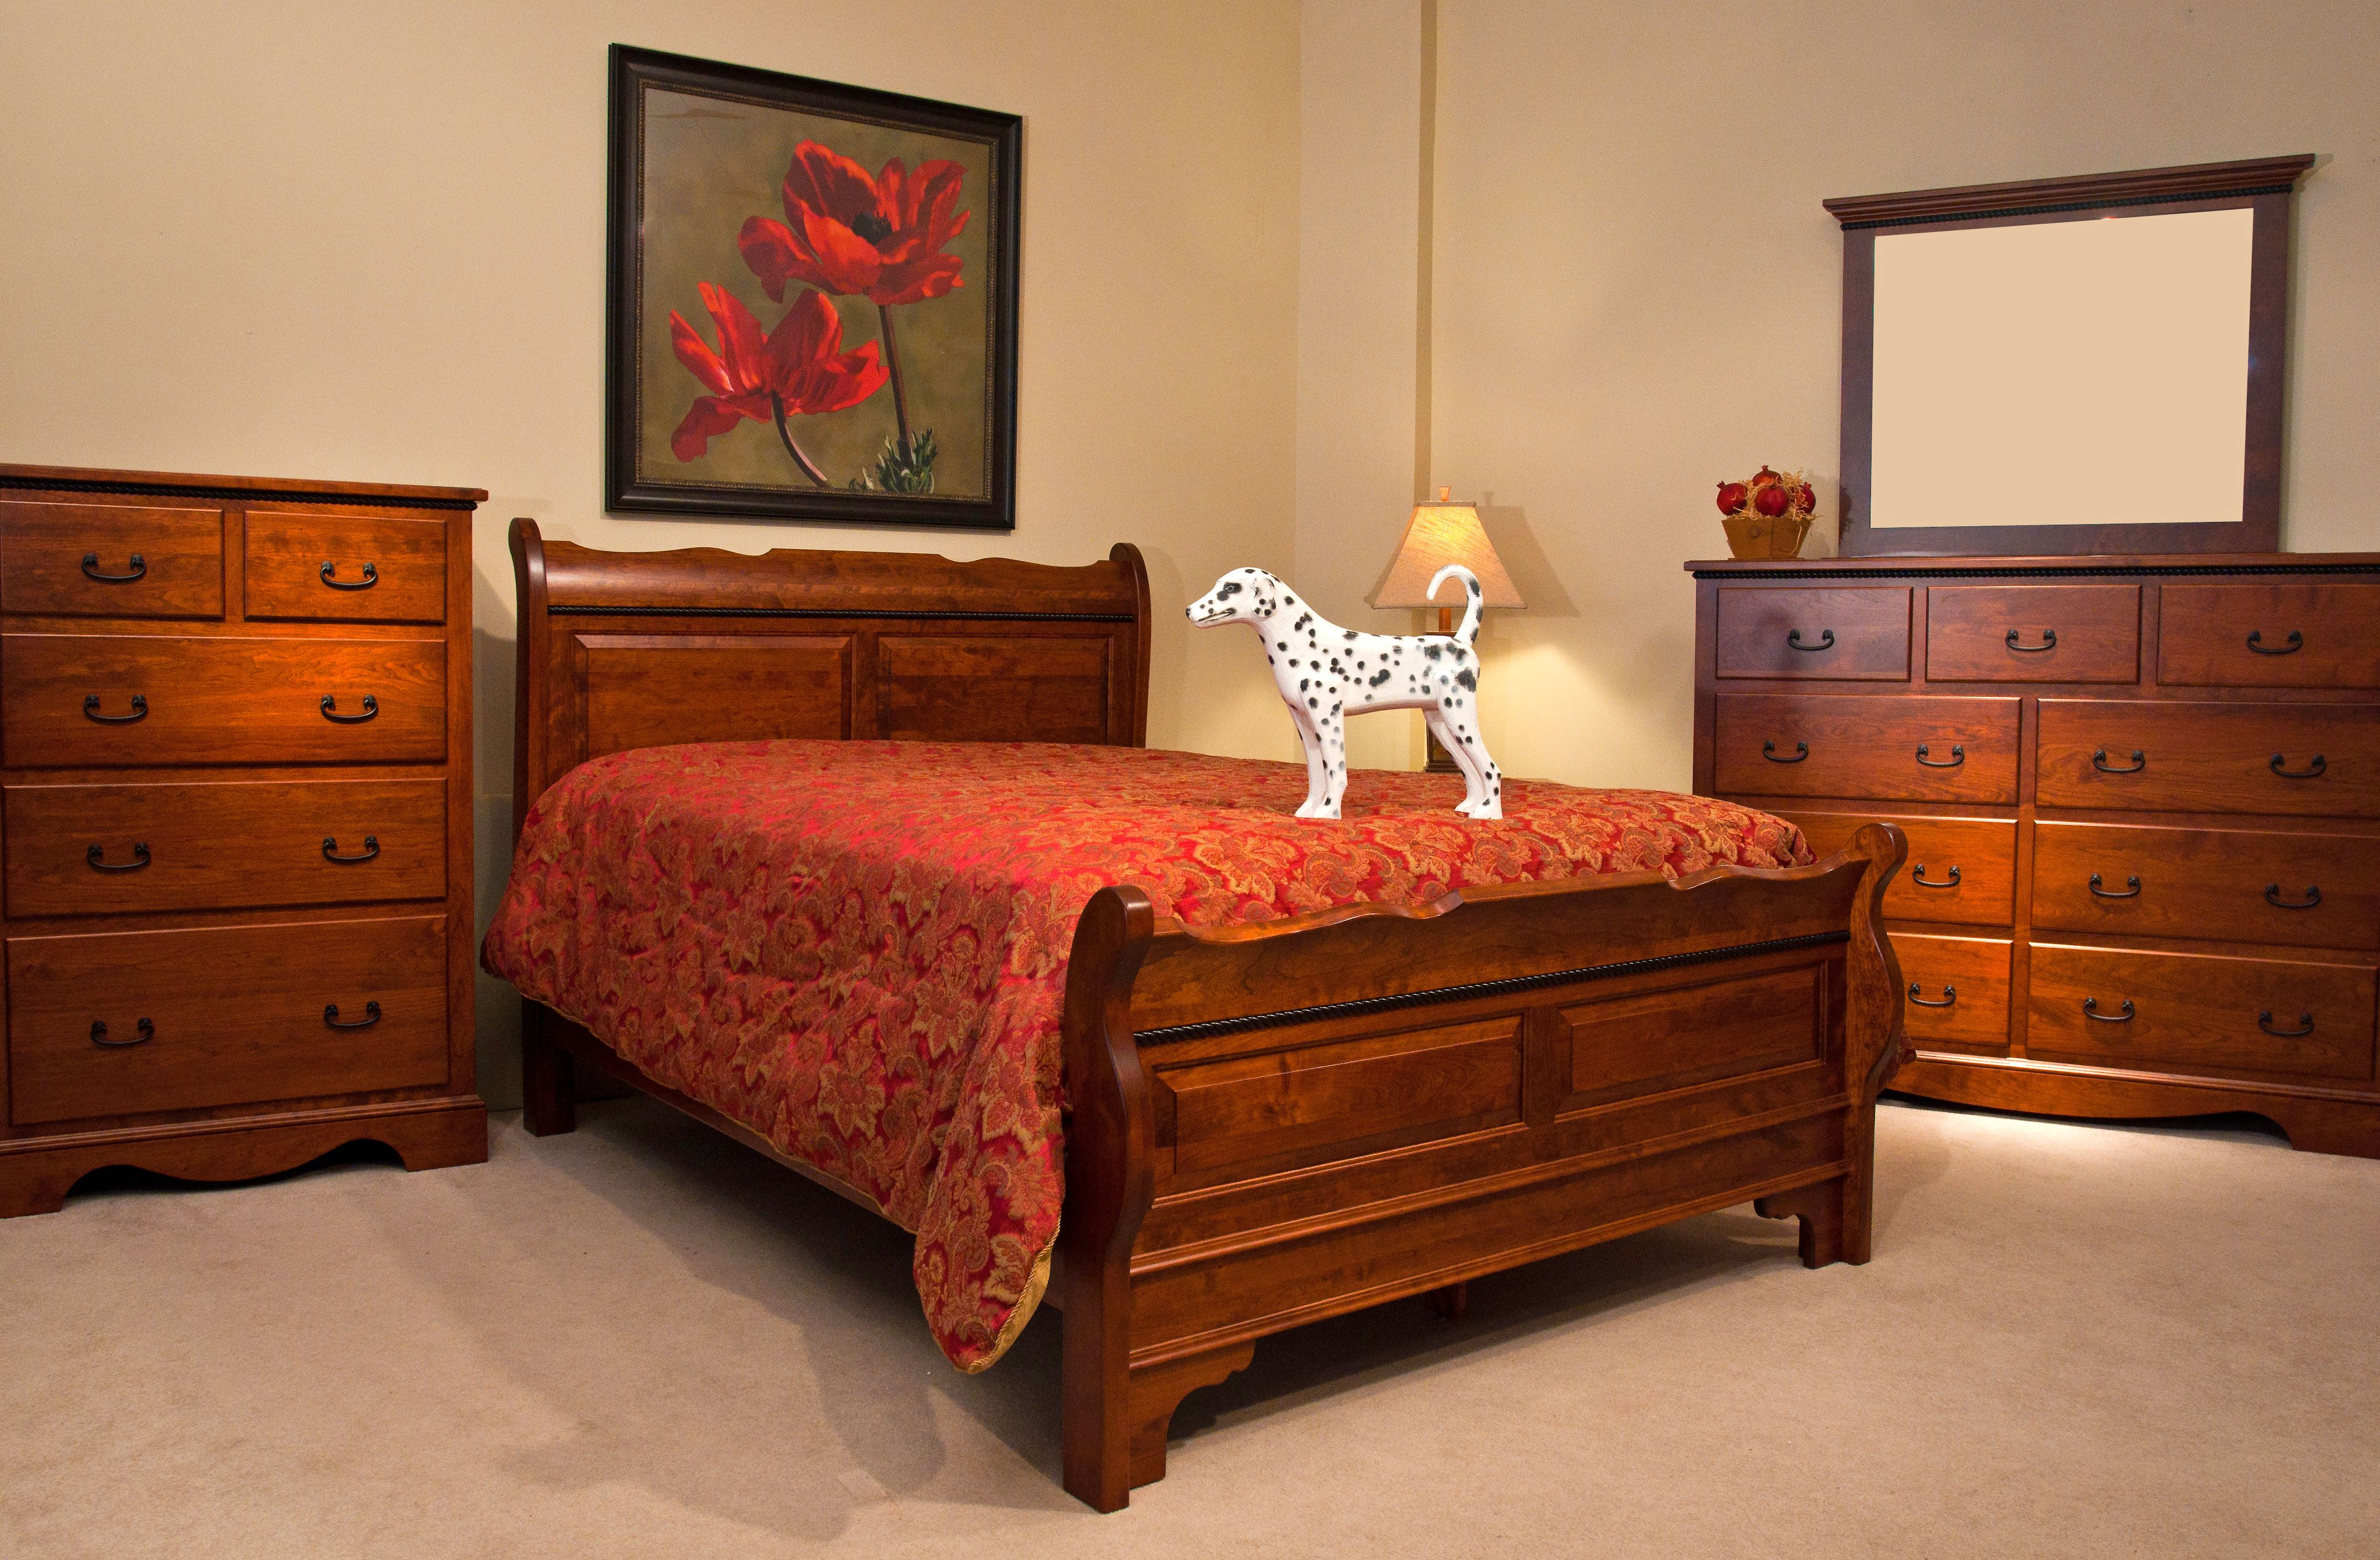 Amish Rustic Cherry Bedroom Furniture Rustic Furniture